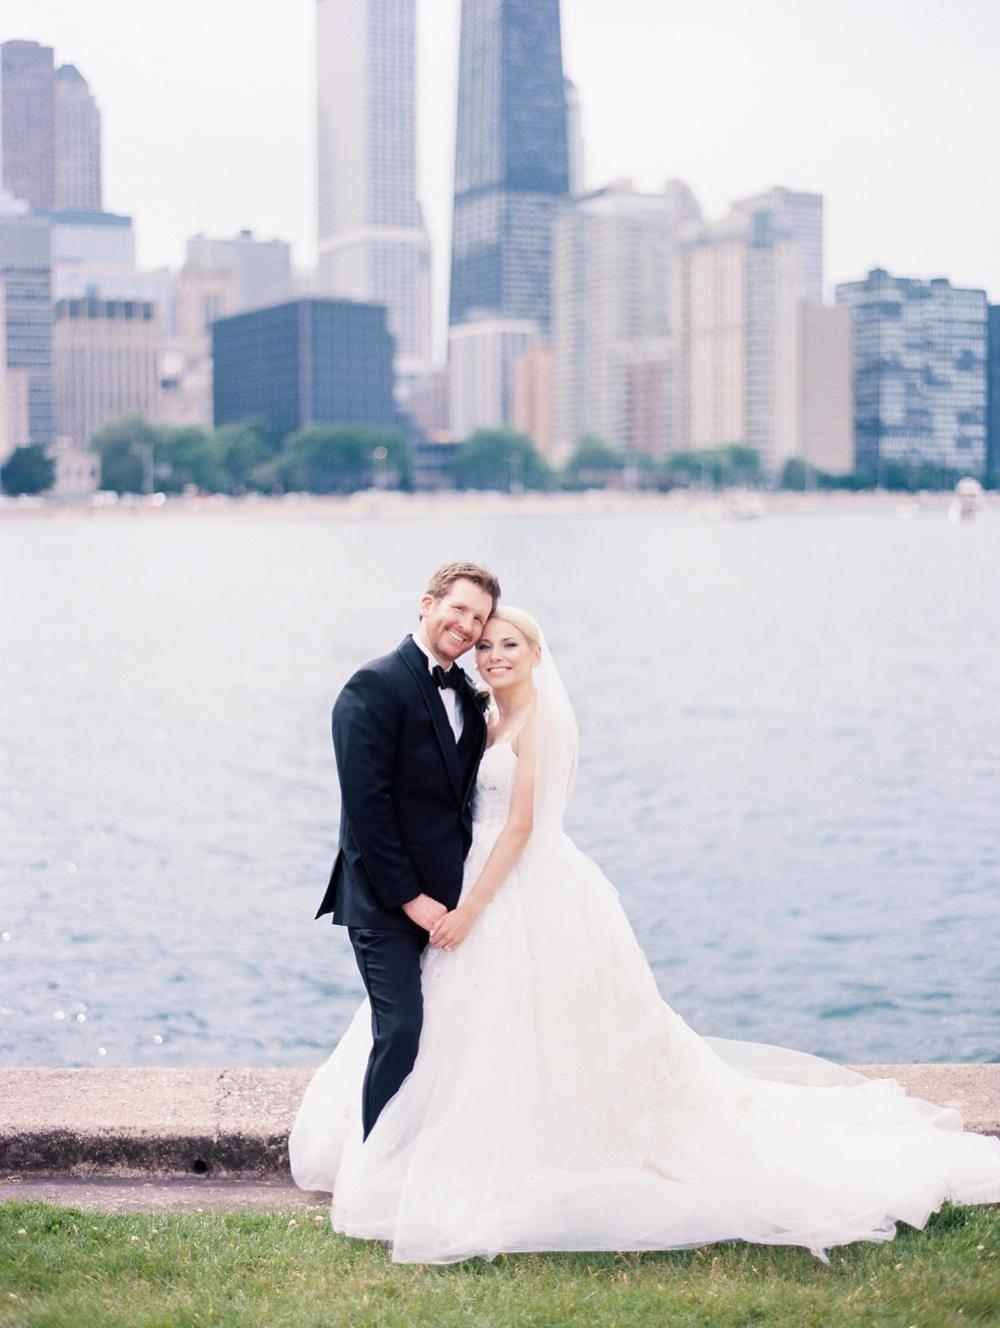 Kristin-La-Voie-Photography-salvatore's-chicago-wedding-photographer-36